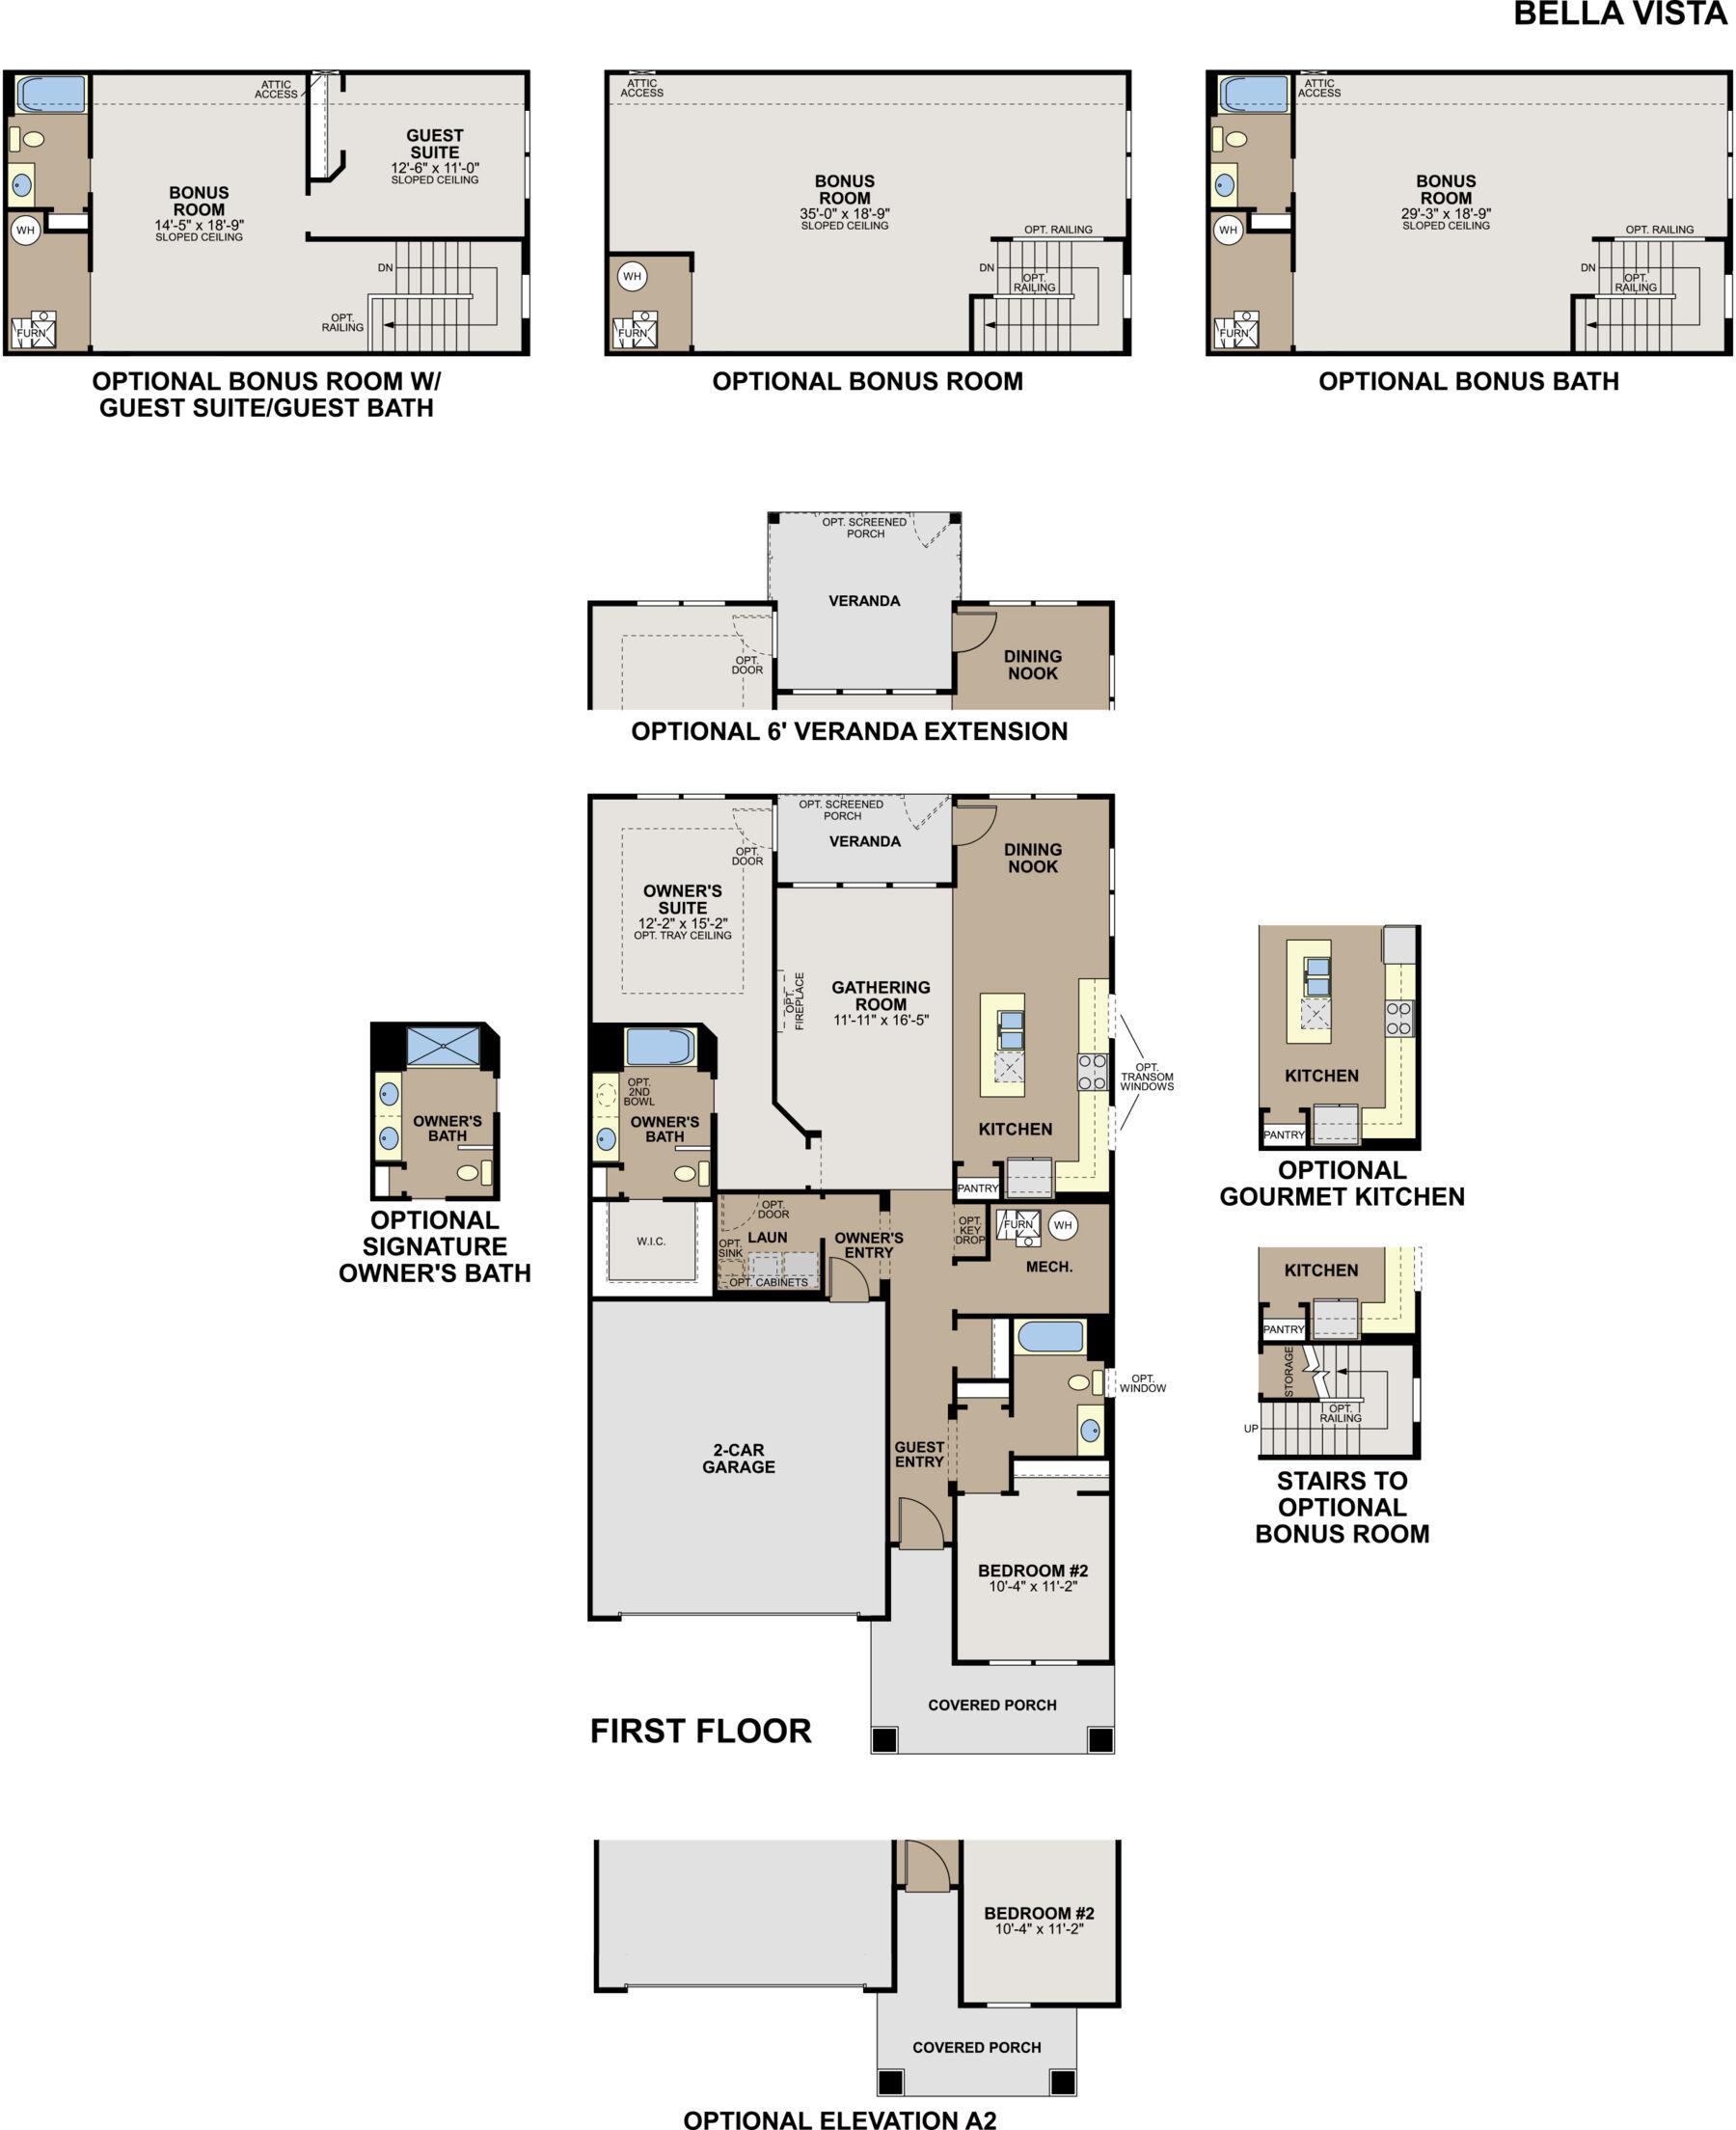 Bella Vista Static Floorplan